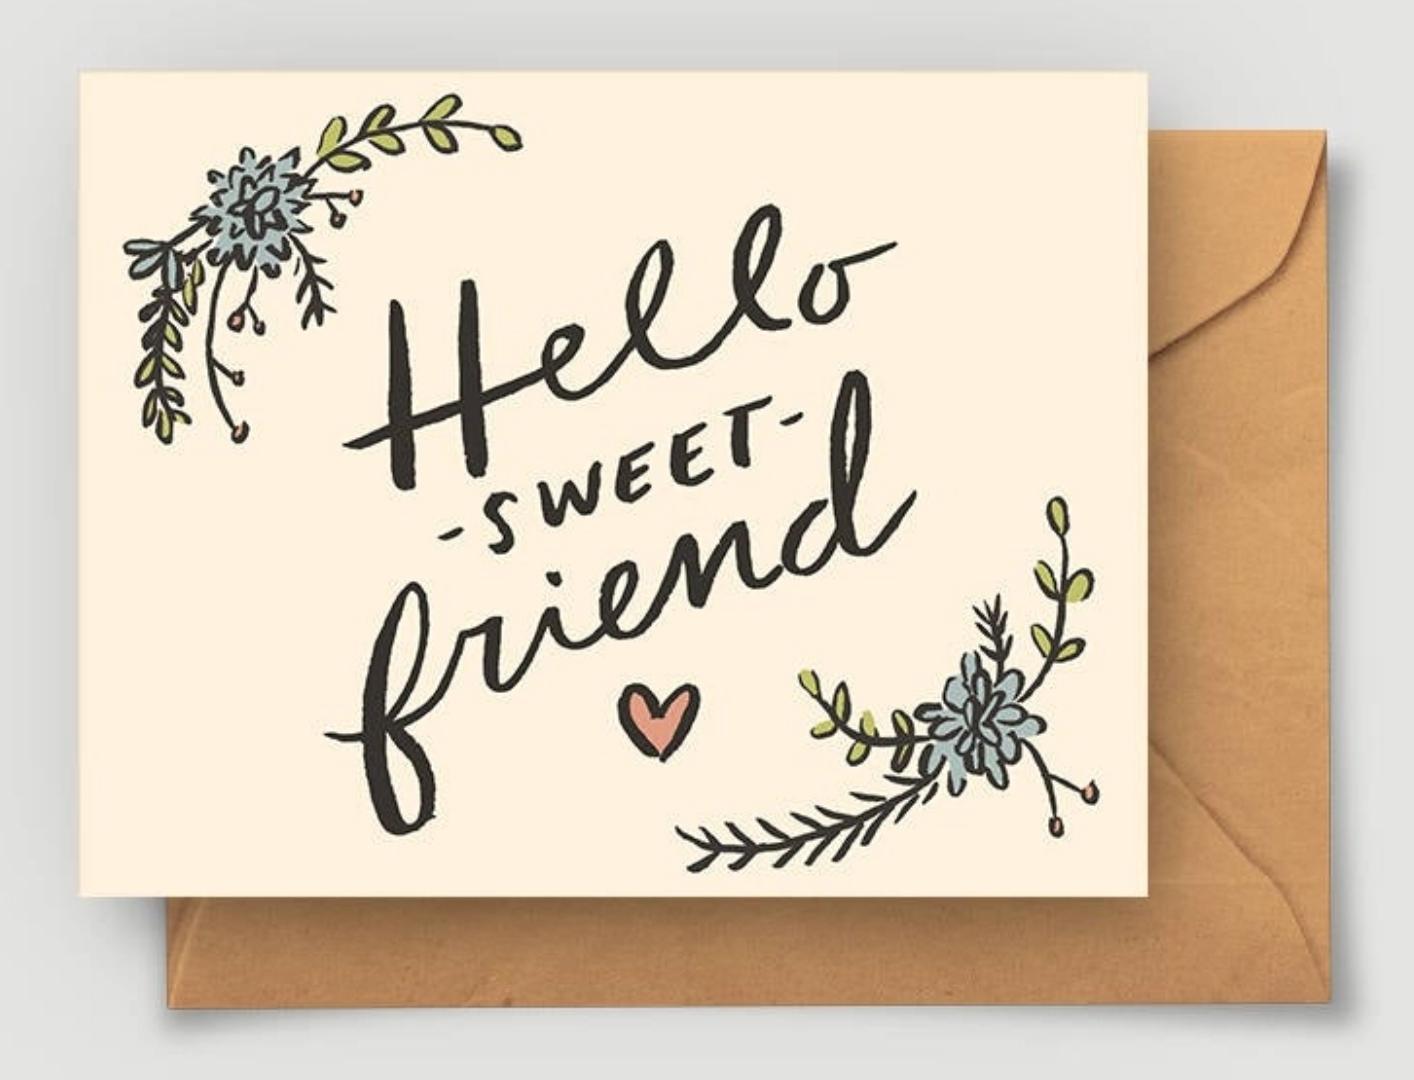 Abbie Paulhus Hello Sweet Friend Greeting Card